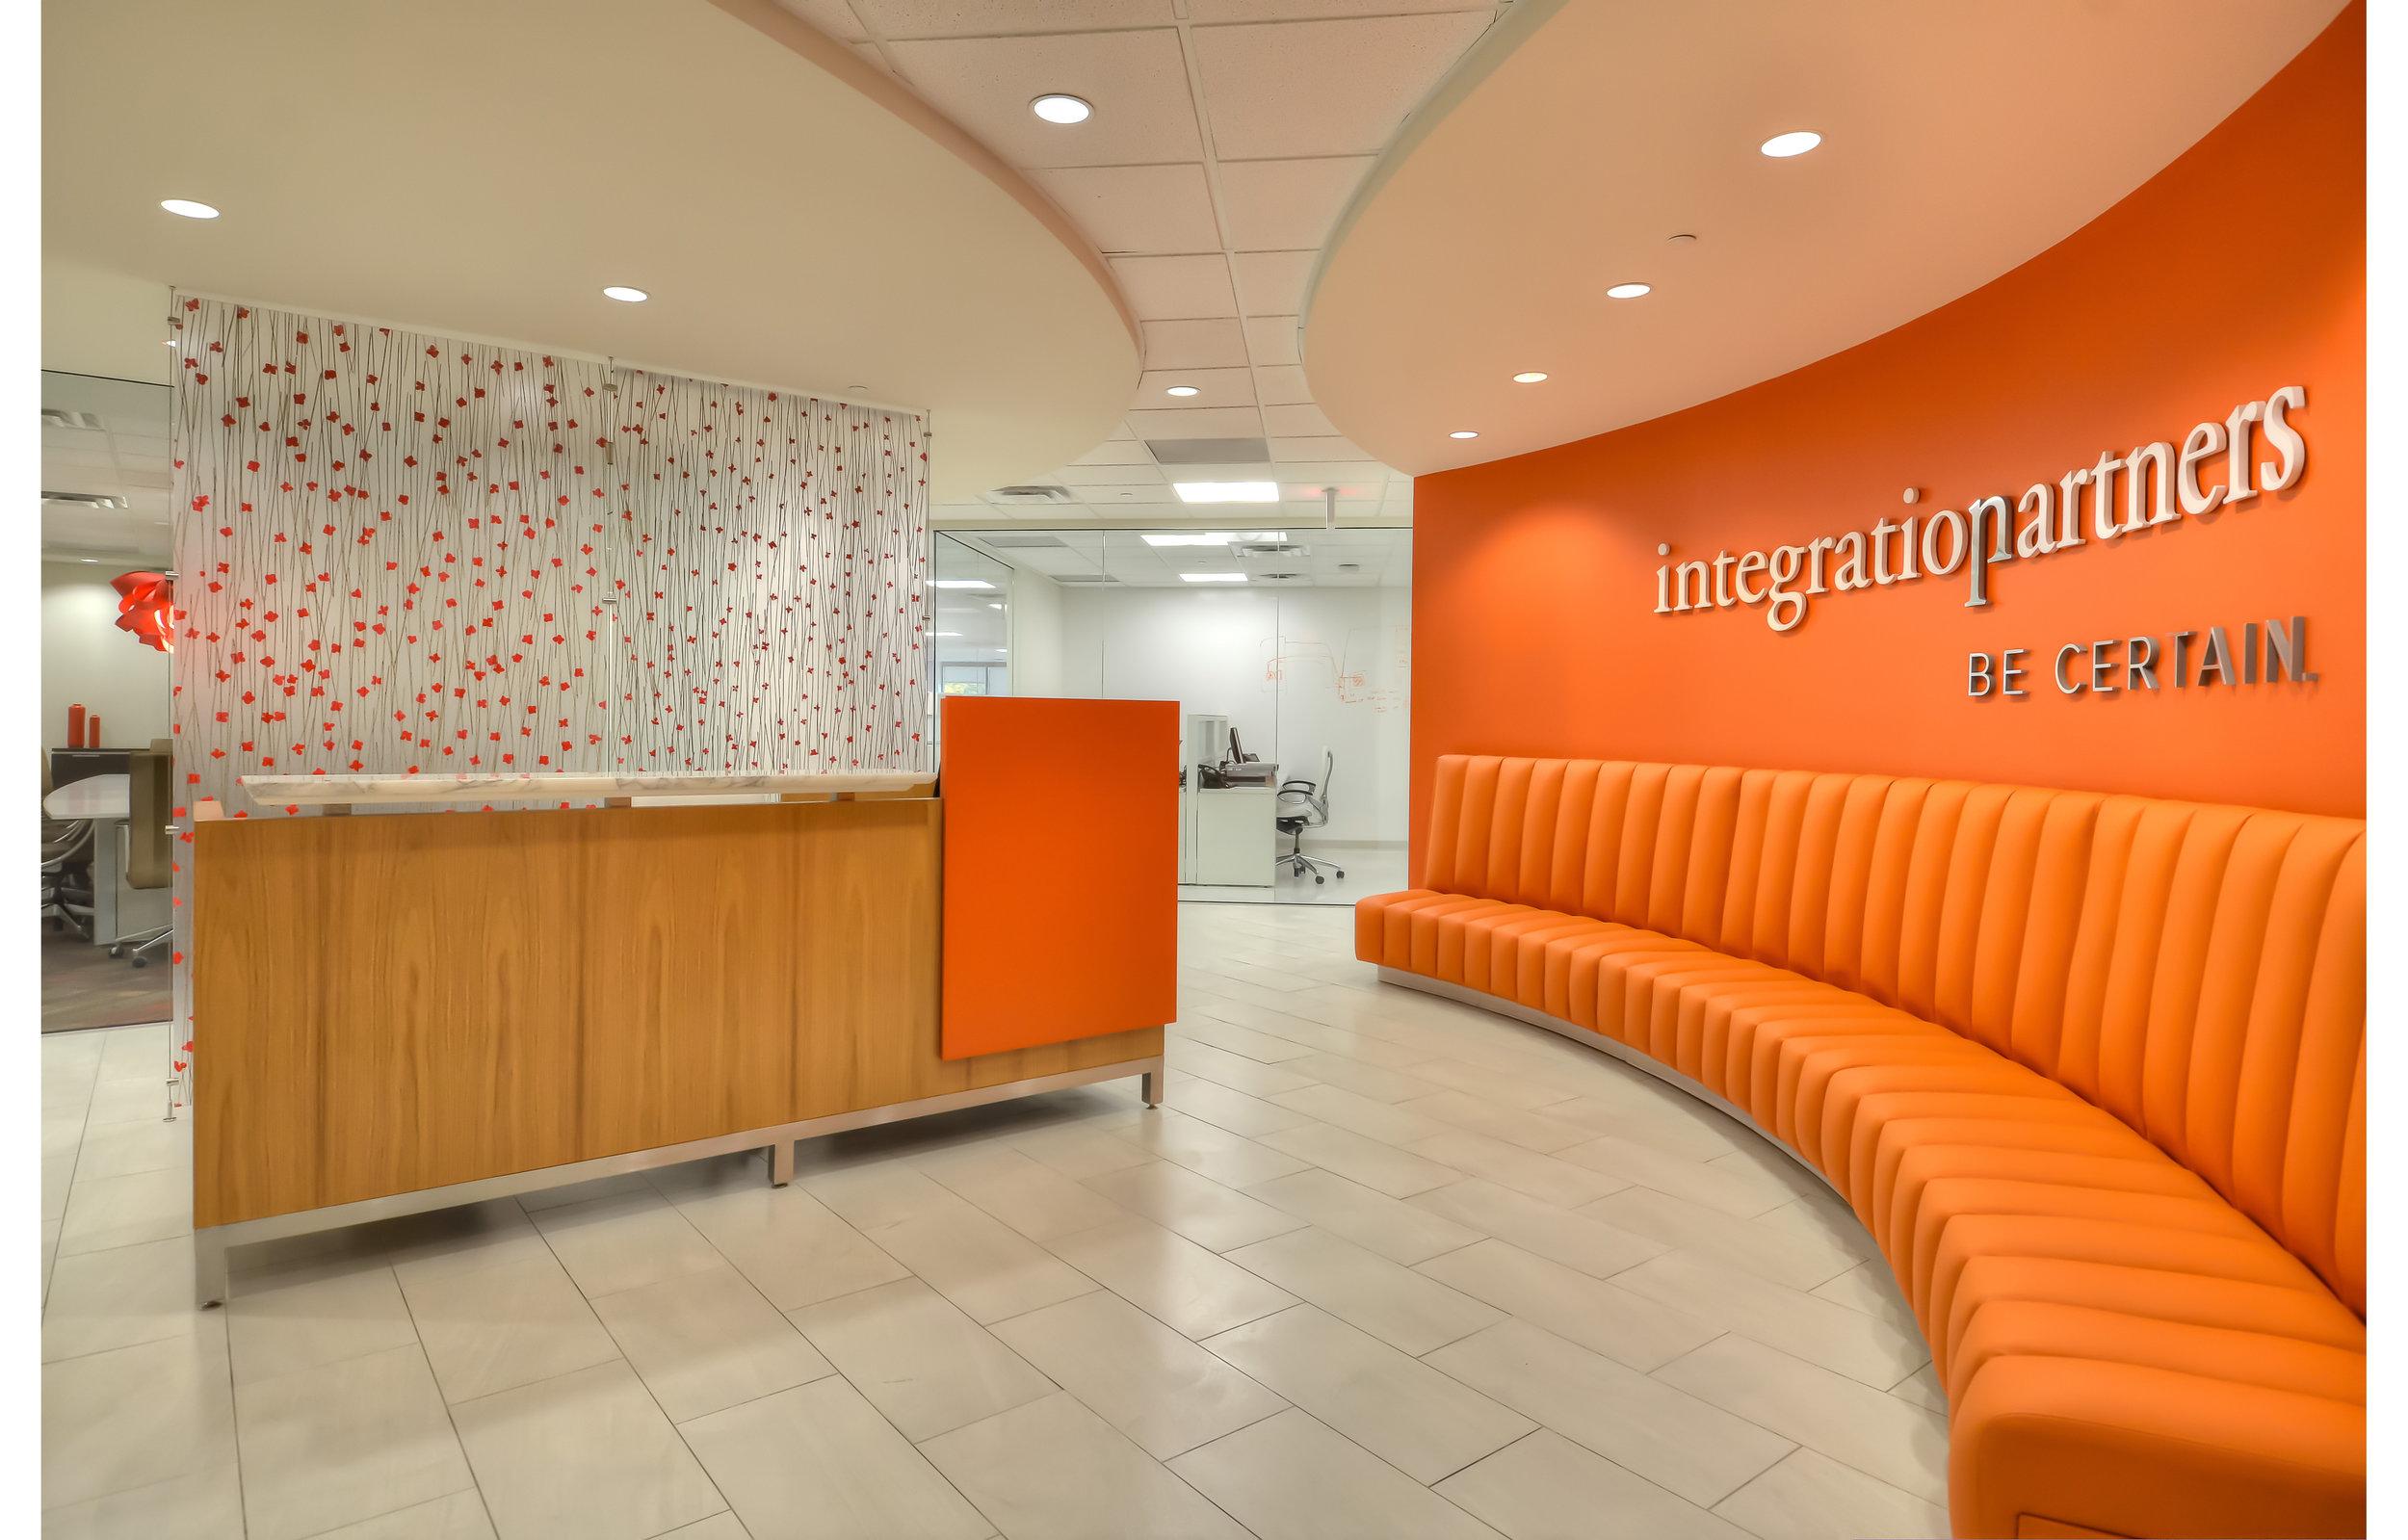 Integration Partners -